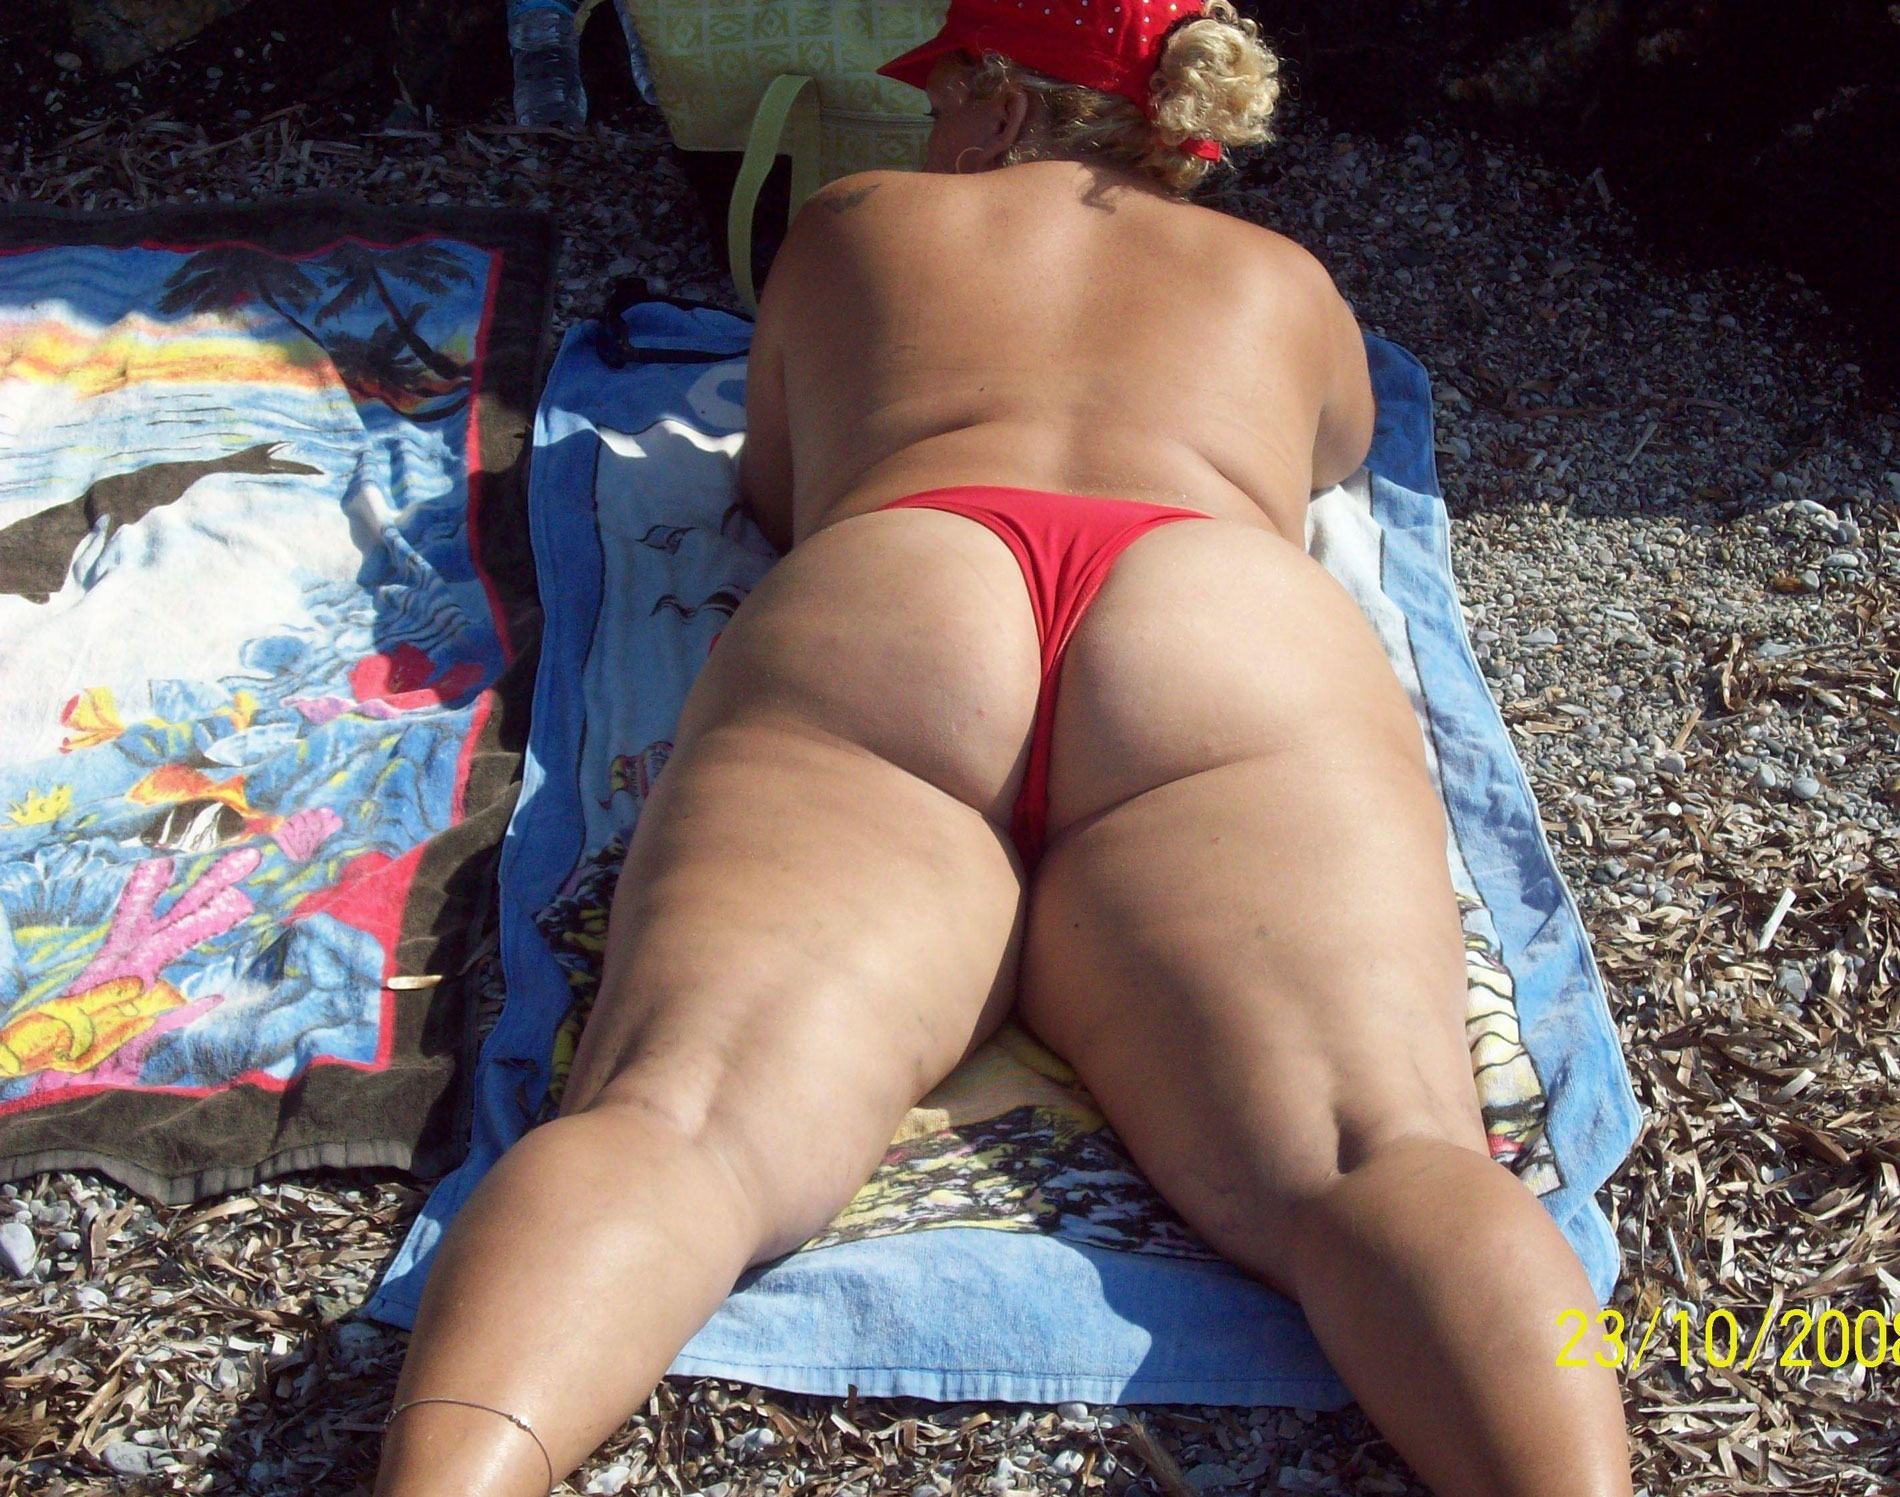 Gallery Granny Sunbathing